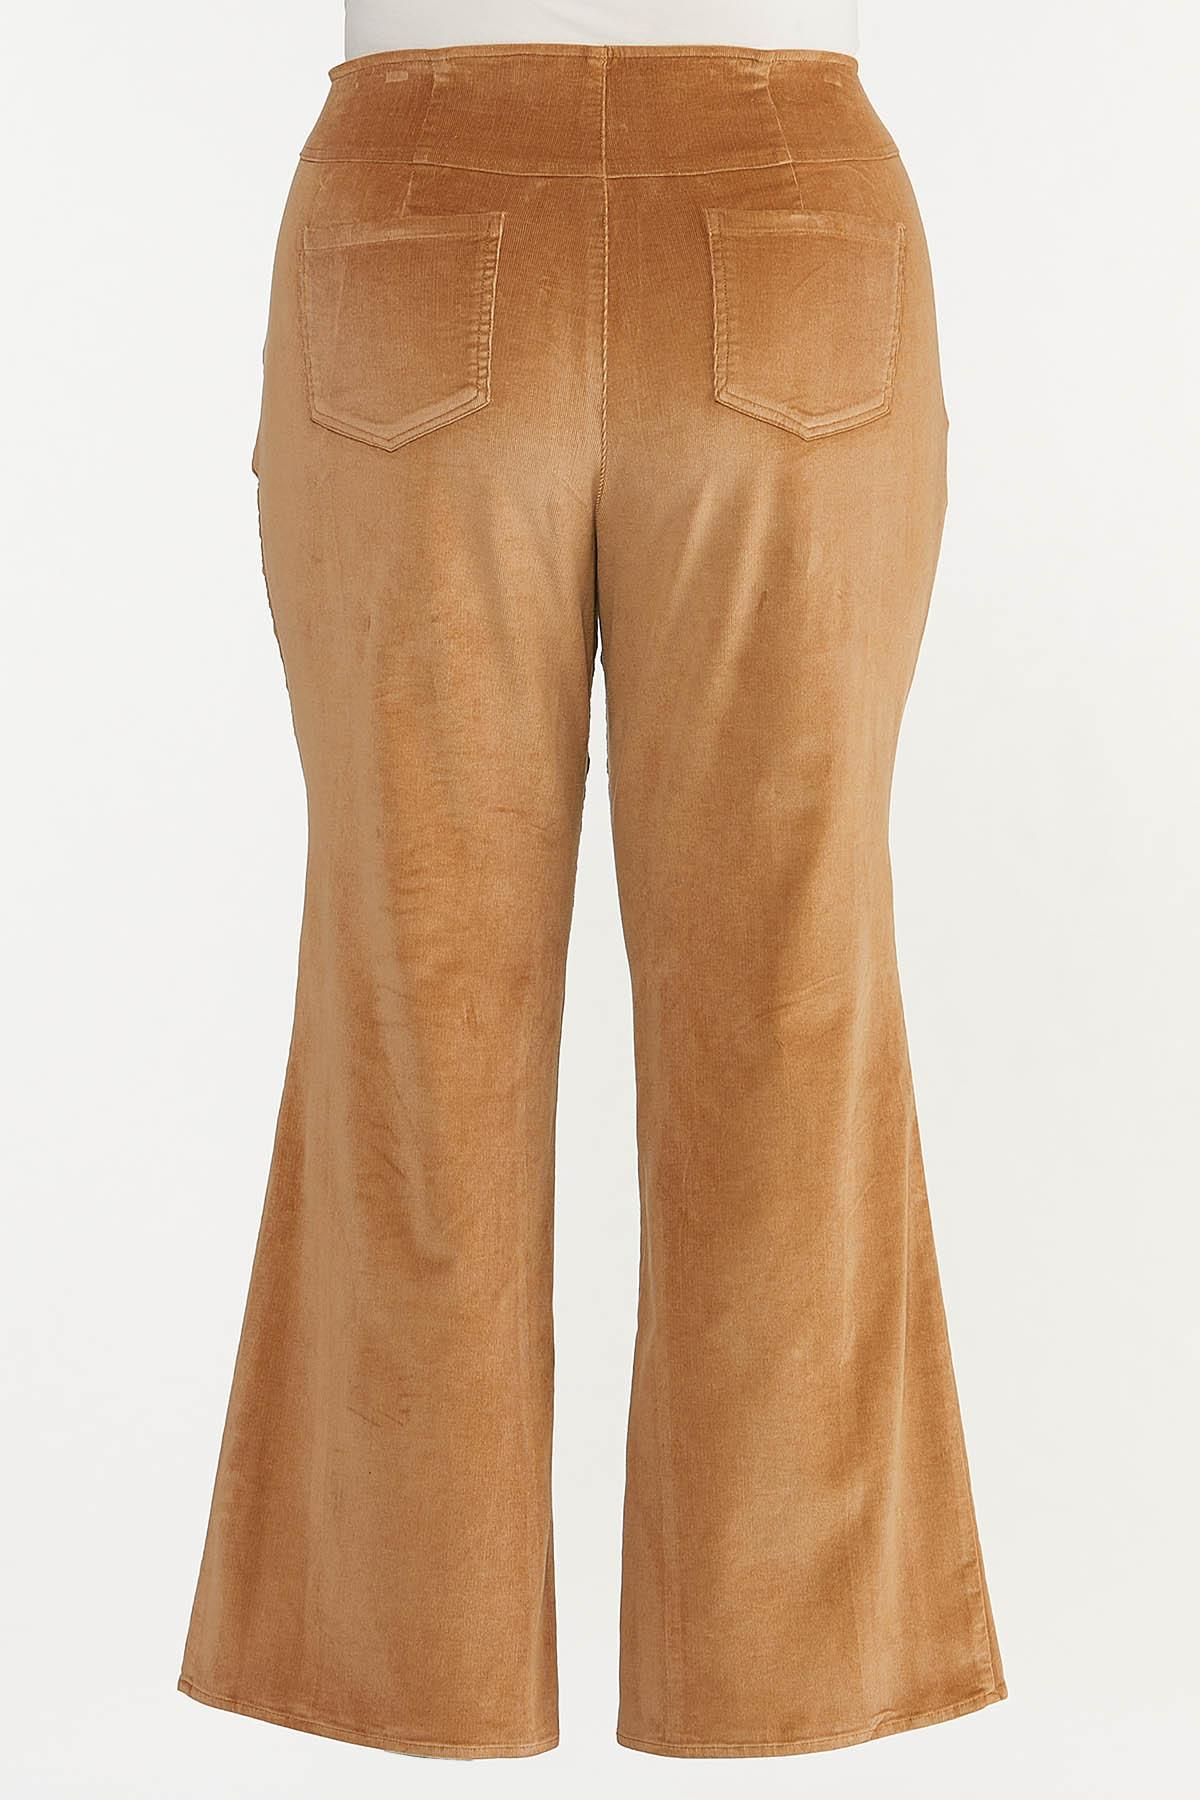 Plus Size Corduroy Flare Pants (Item #44640402)